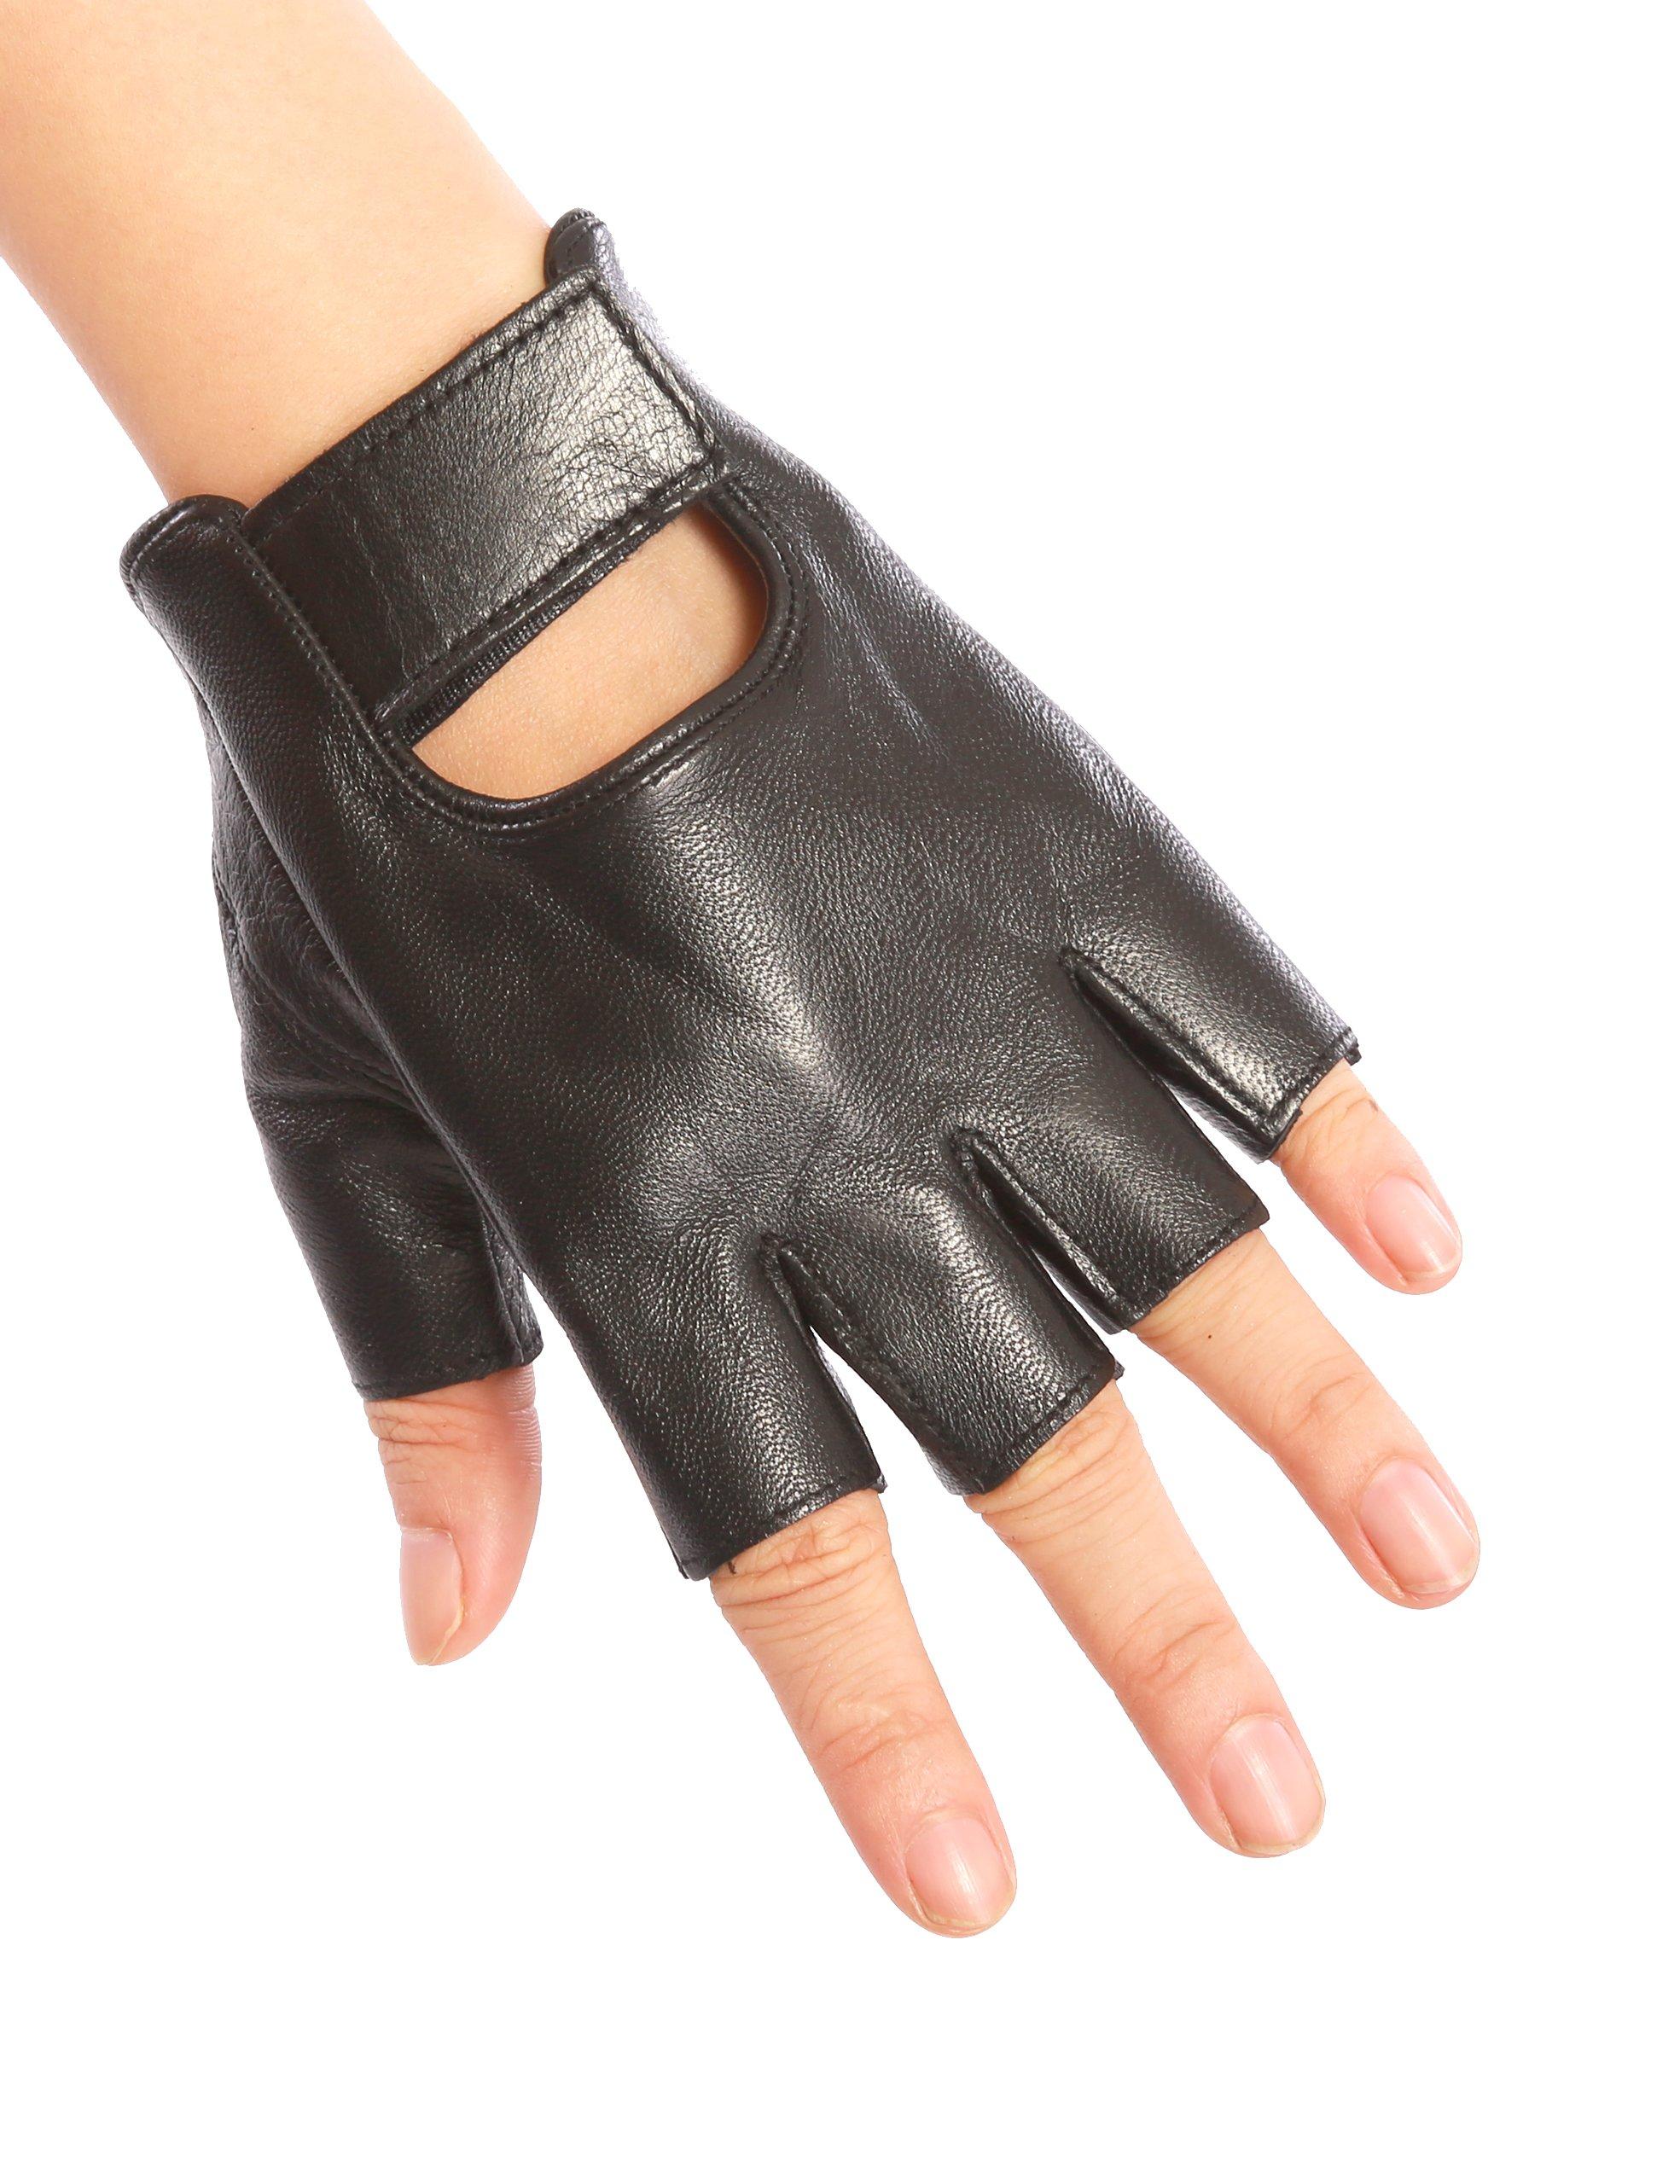 May&Maya Women's Genuine Nappa Leather Fingerless Motorcycle Fashion Driving Gloves (Black S)